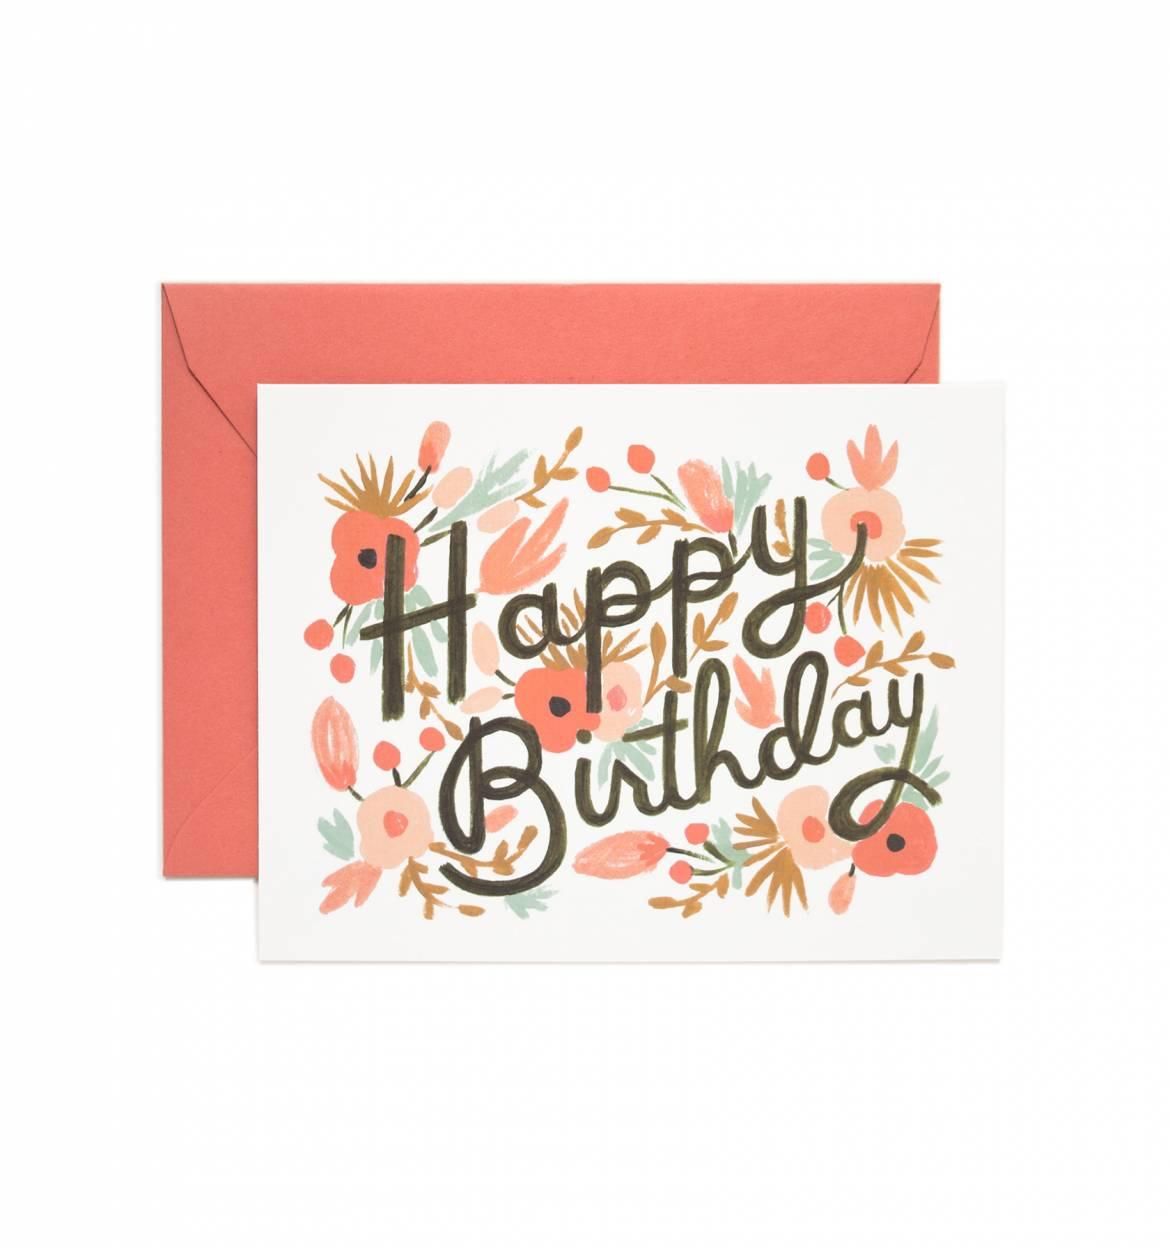 rifle-paper-co-floral-burst-birthday-card-01-n_1.jpg